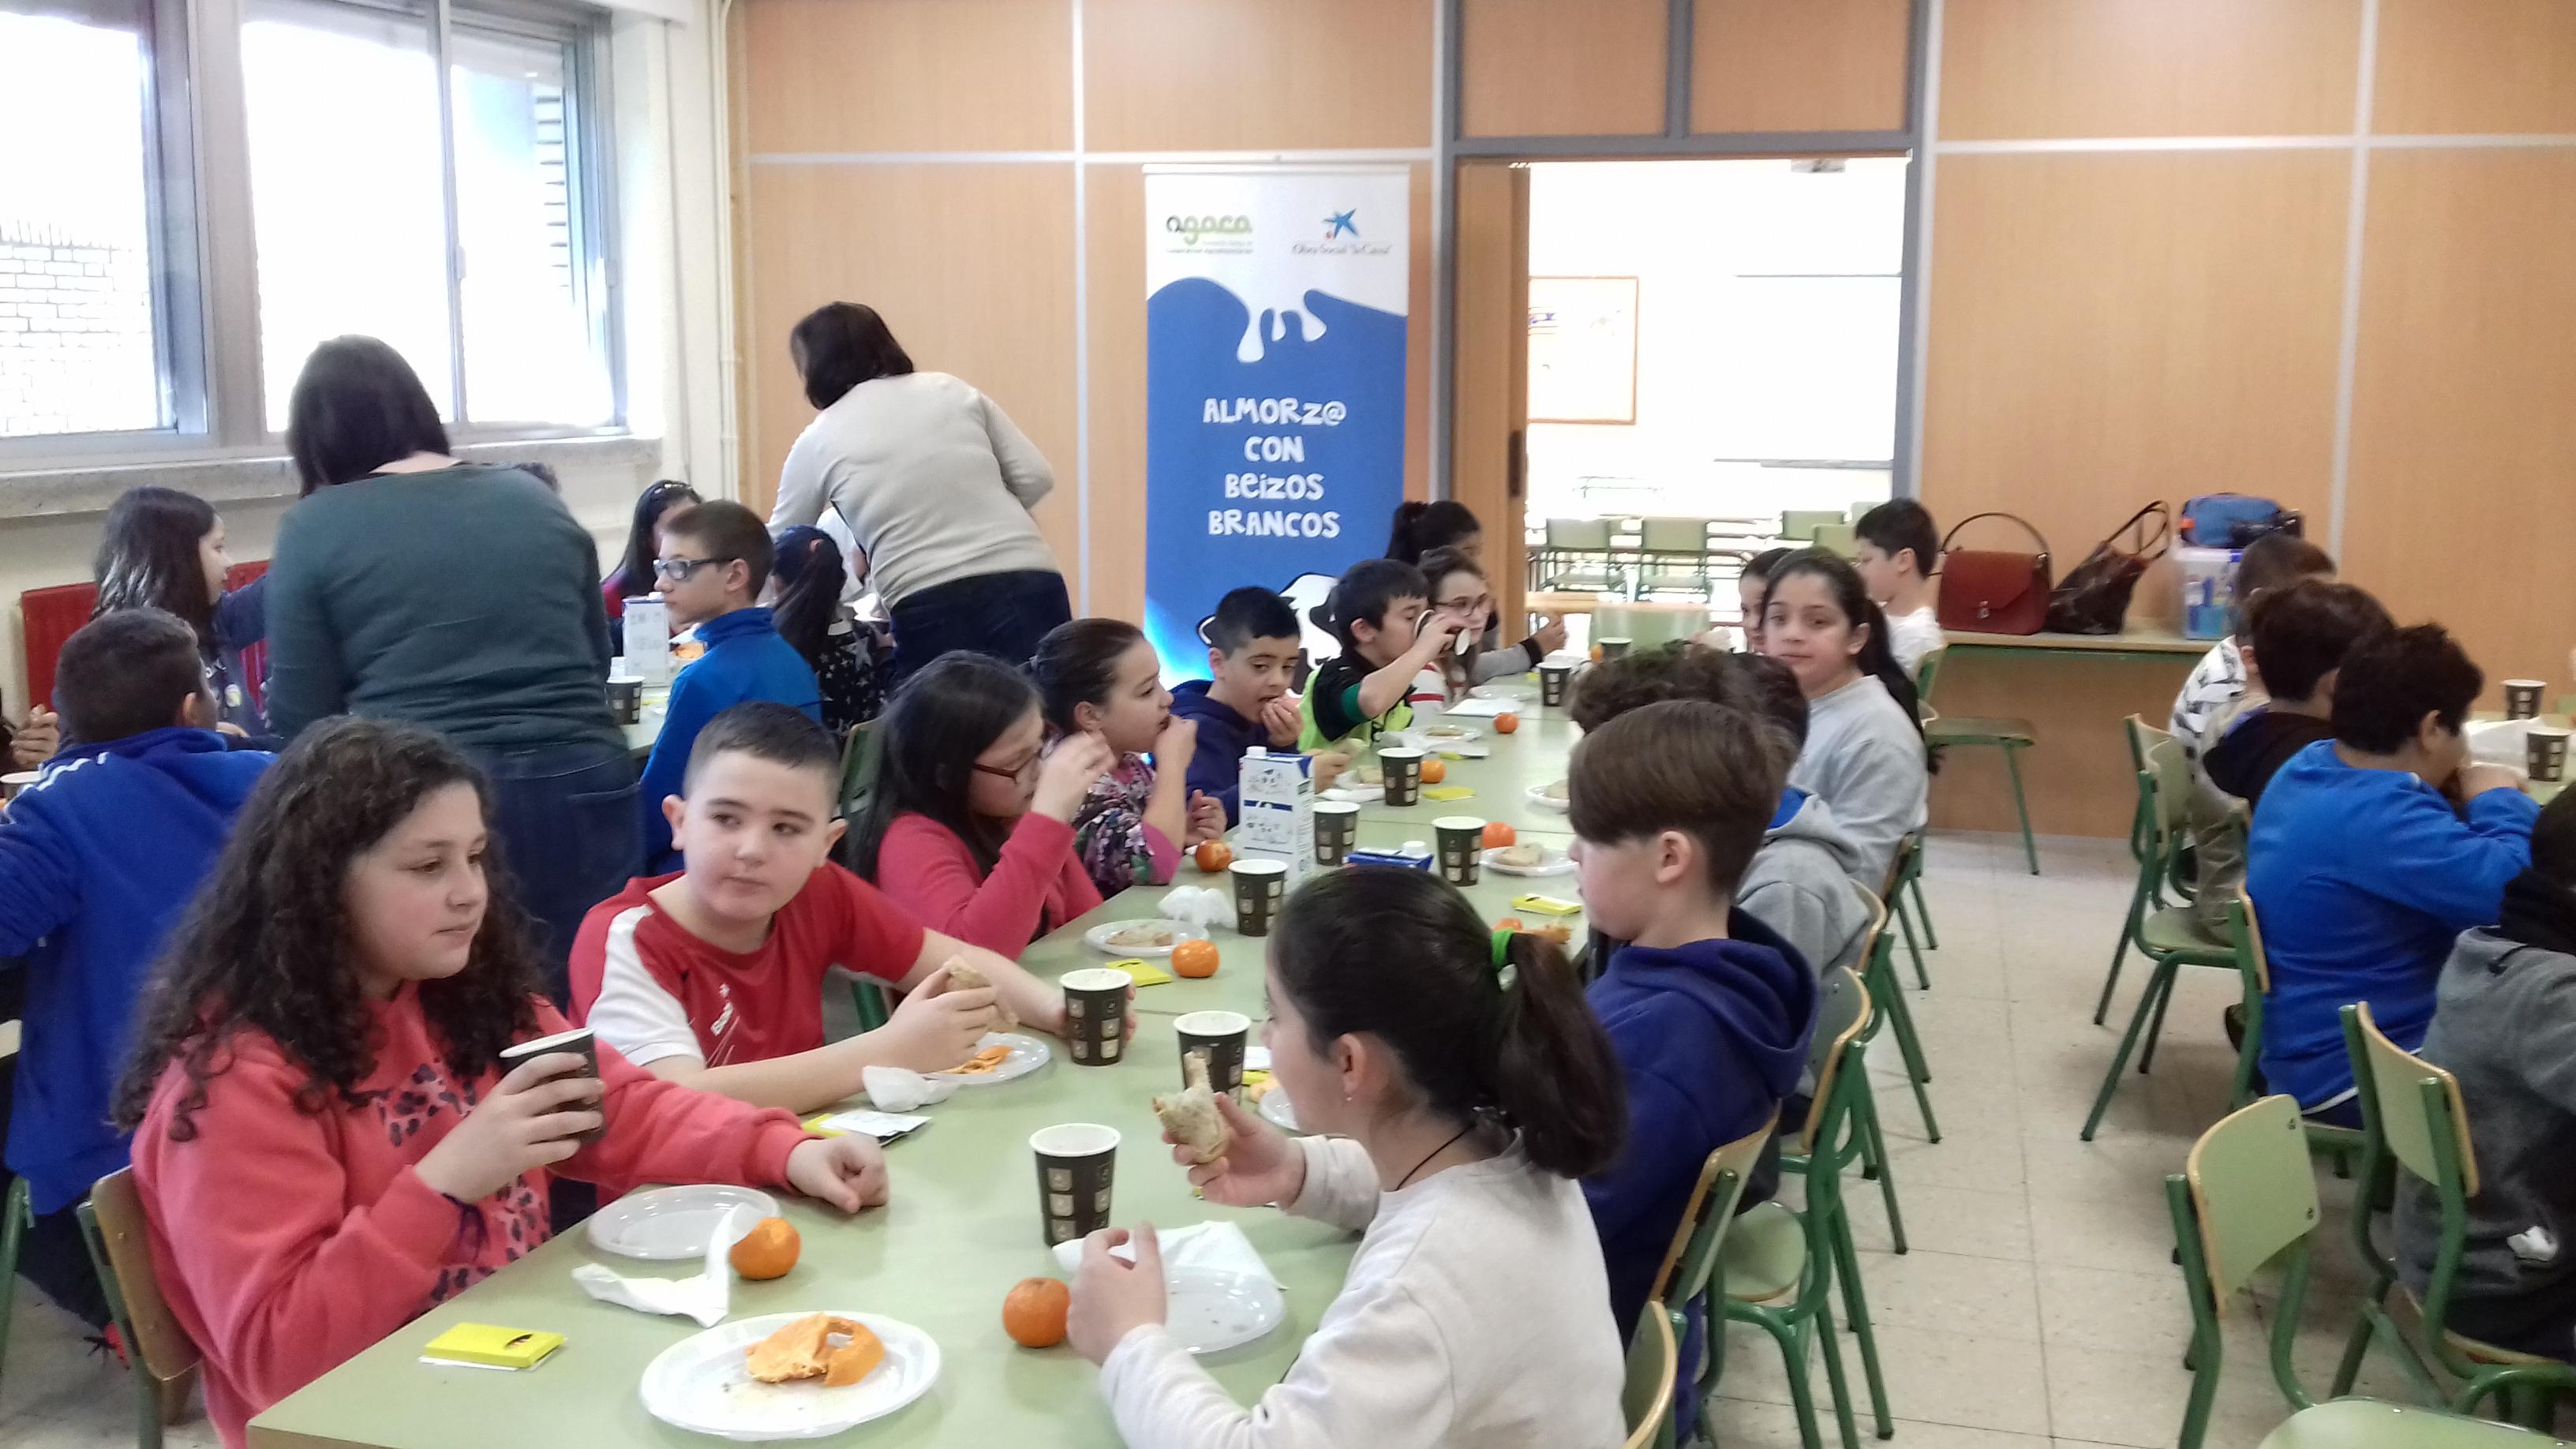 Leche, fruta y pan para educar en nutrición sana a estudiantes de Ourense